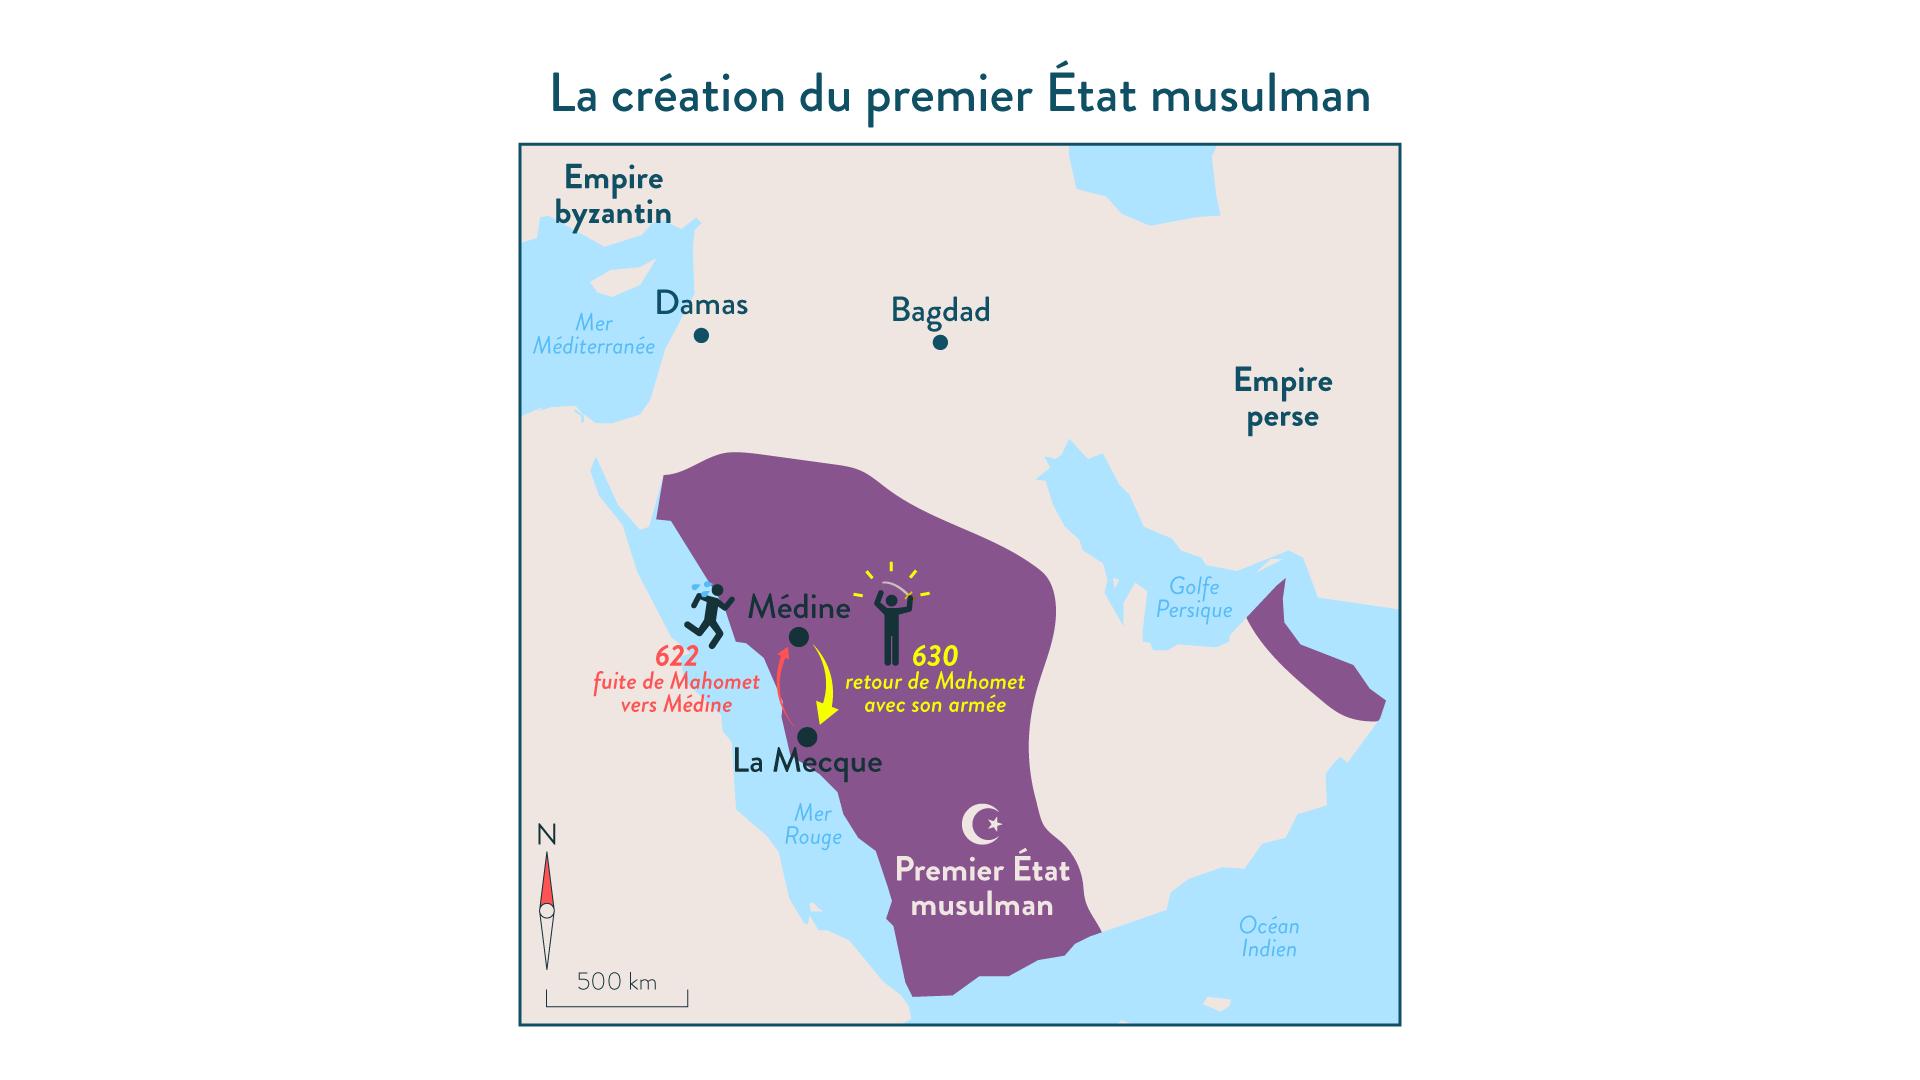 L'Empire arabo-musulman au temps de Mahomet - histoire - 5e